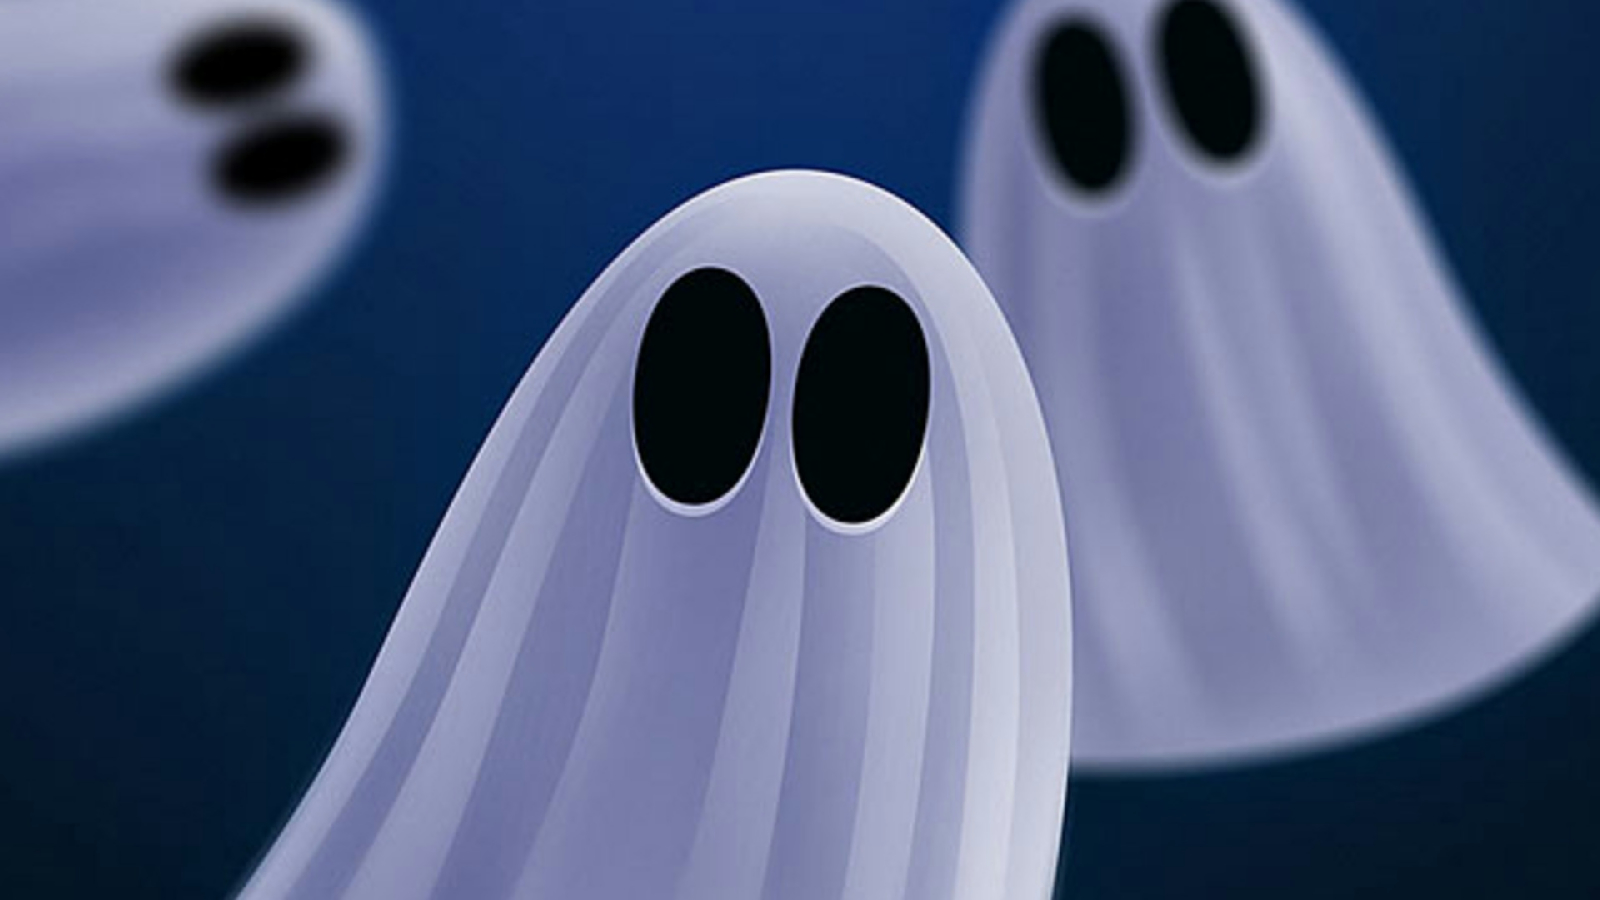 http://4.bp.blogspot.com/-4ye_gWyeh-o/UEPoHwZX-vI/AAAAAAAAKvc/CbvlzRHkdn4/s1600/Halloween_100-715392.jpg